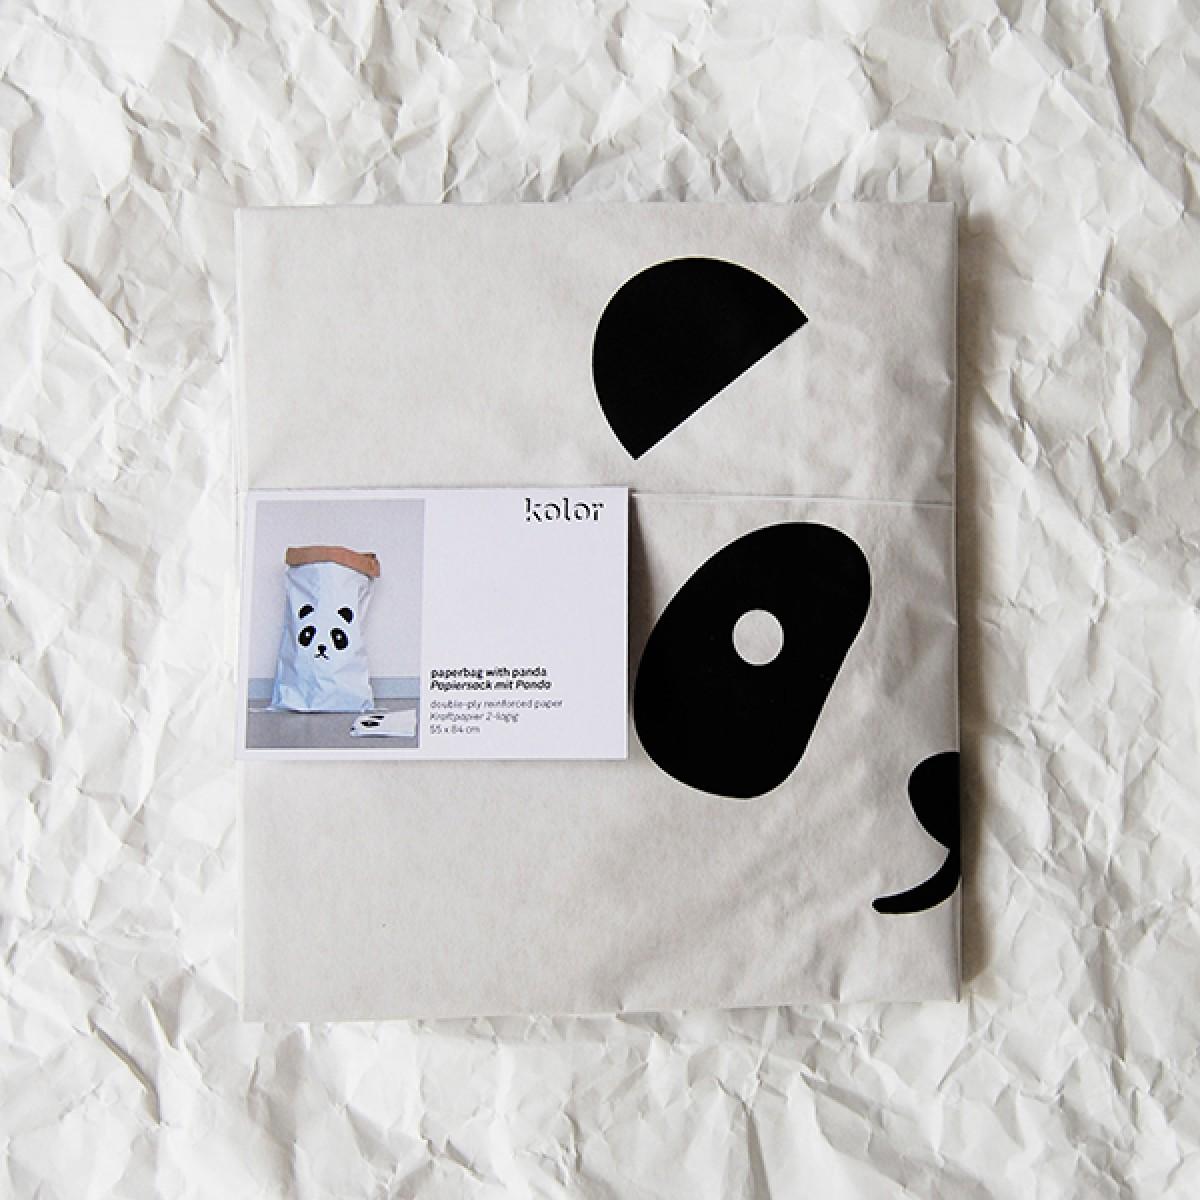 kolor Papiersack Panda